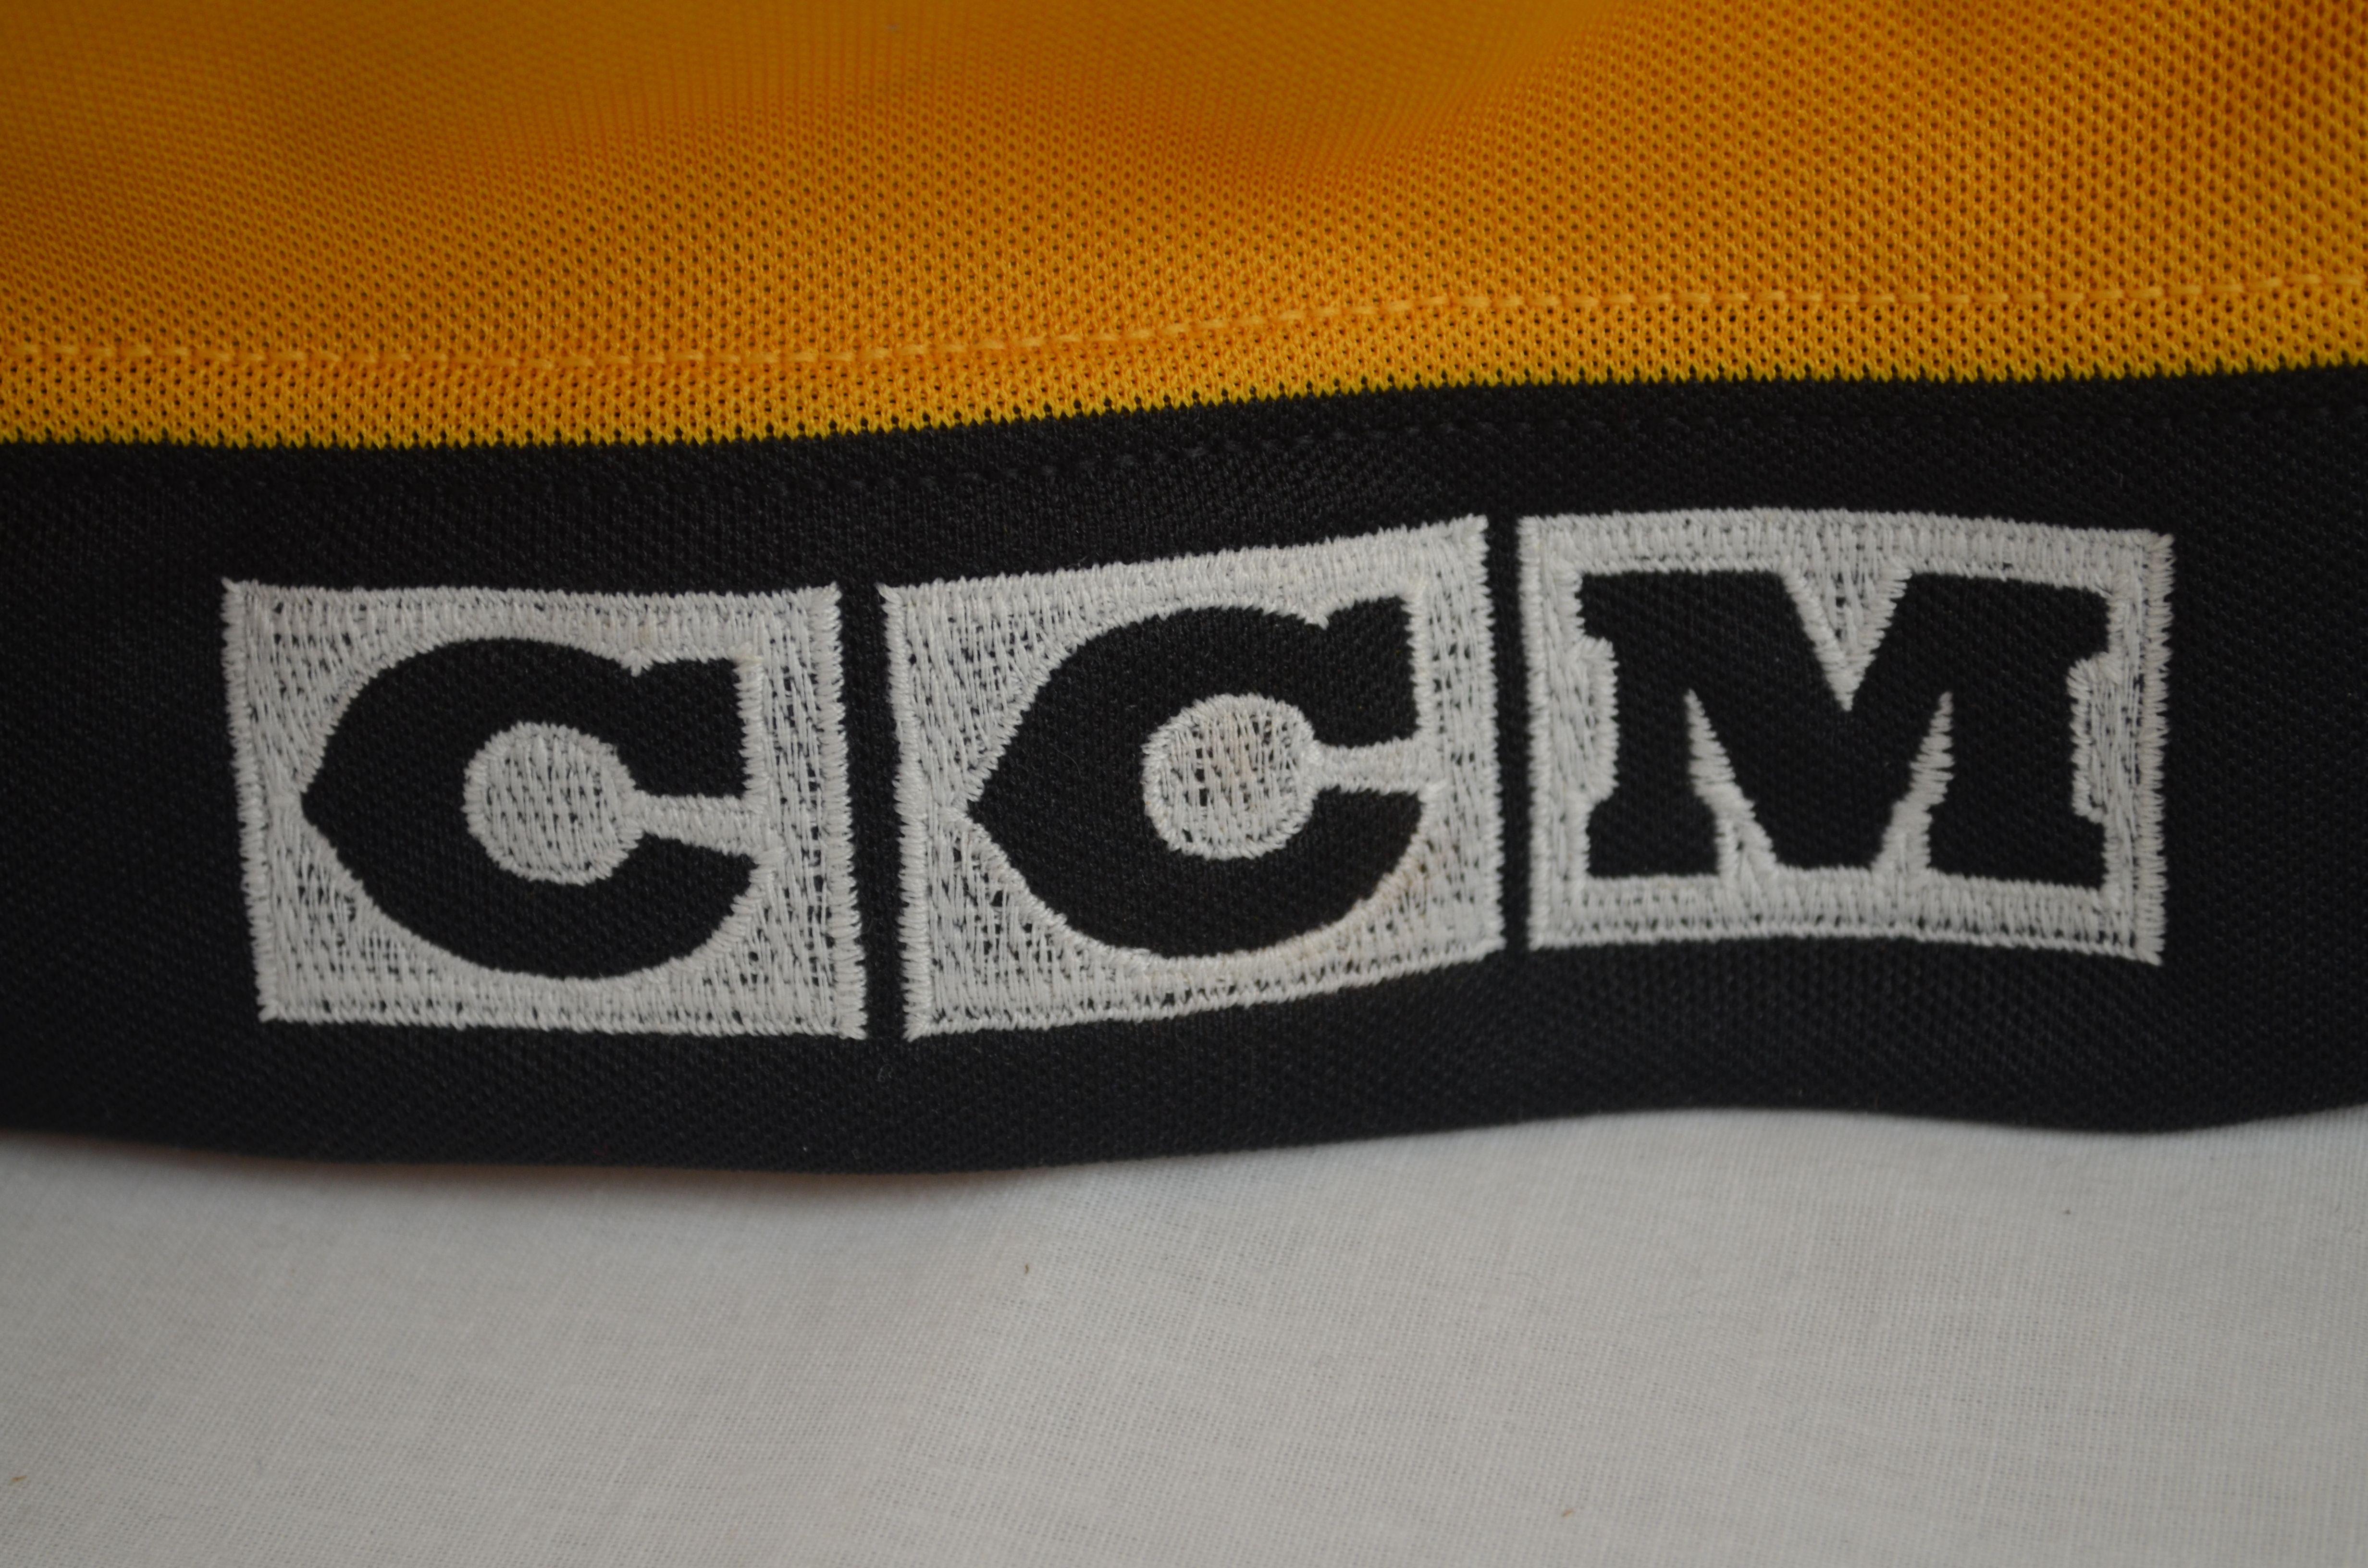 704ccfa82b2bd4 Lot Detail - Bobby Orr Autographed Boston Bruins Jersey